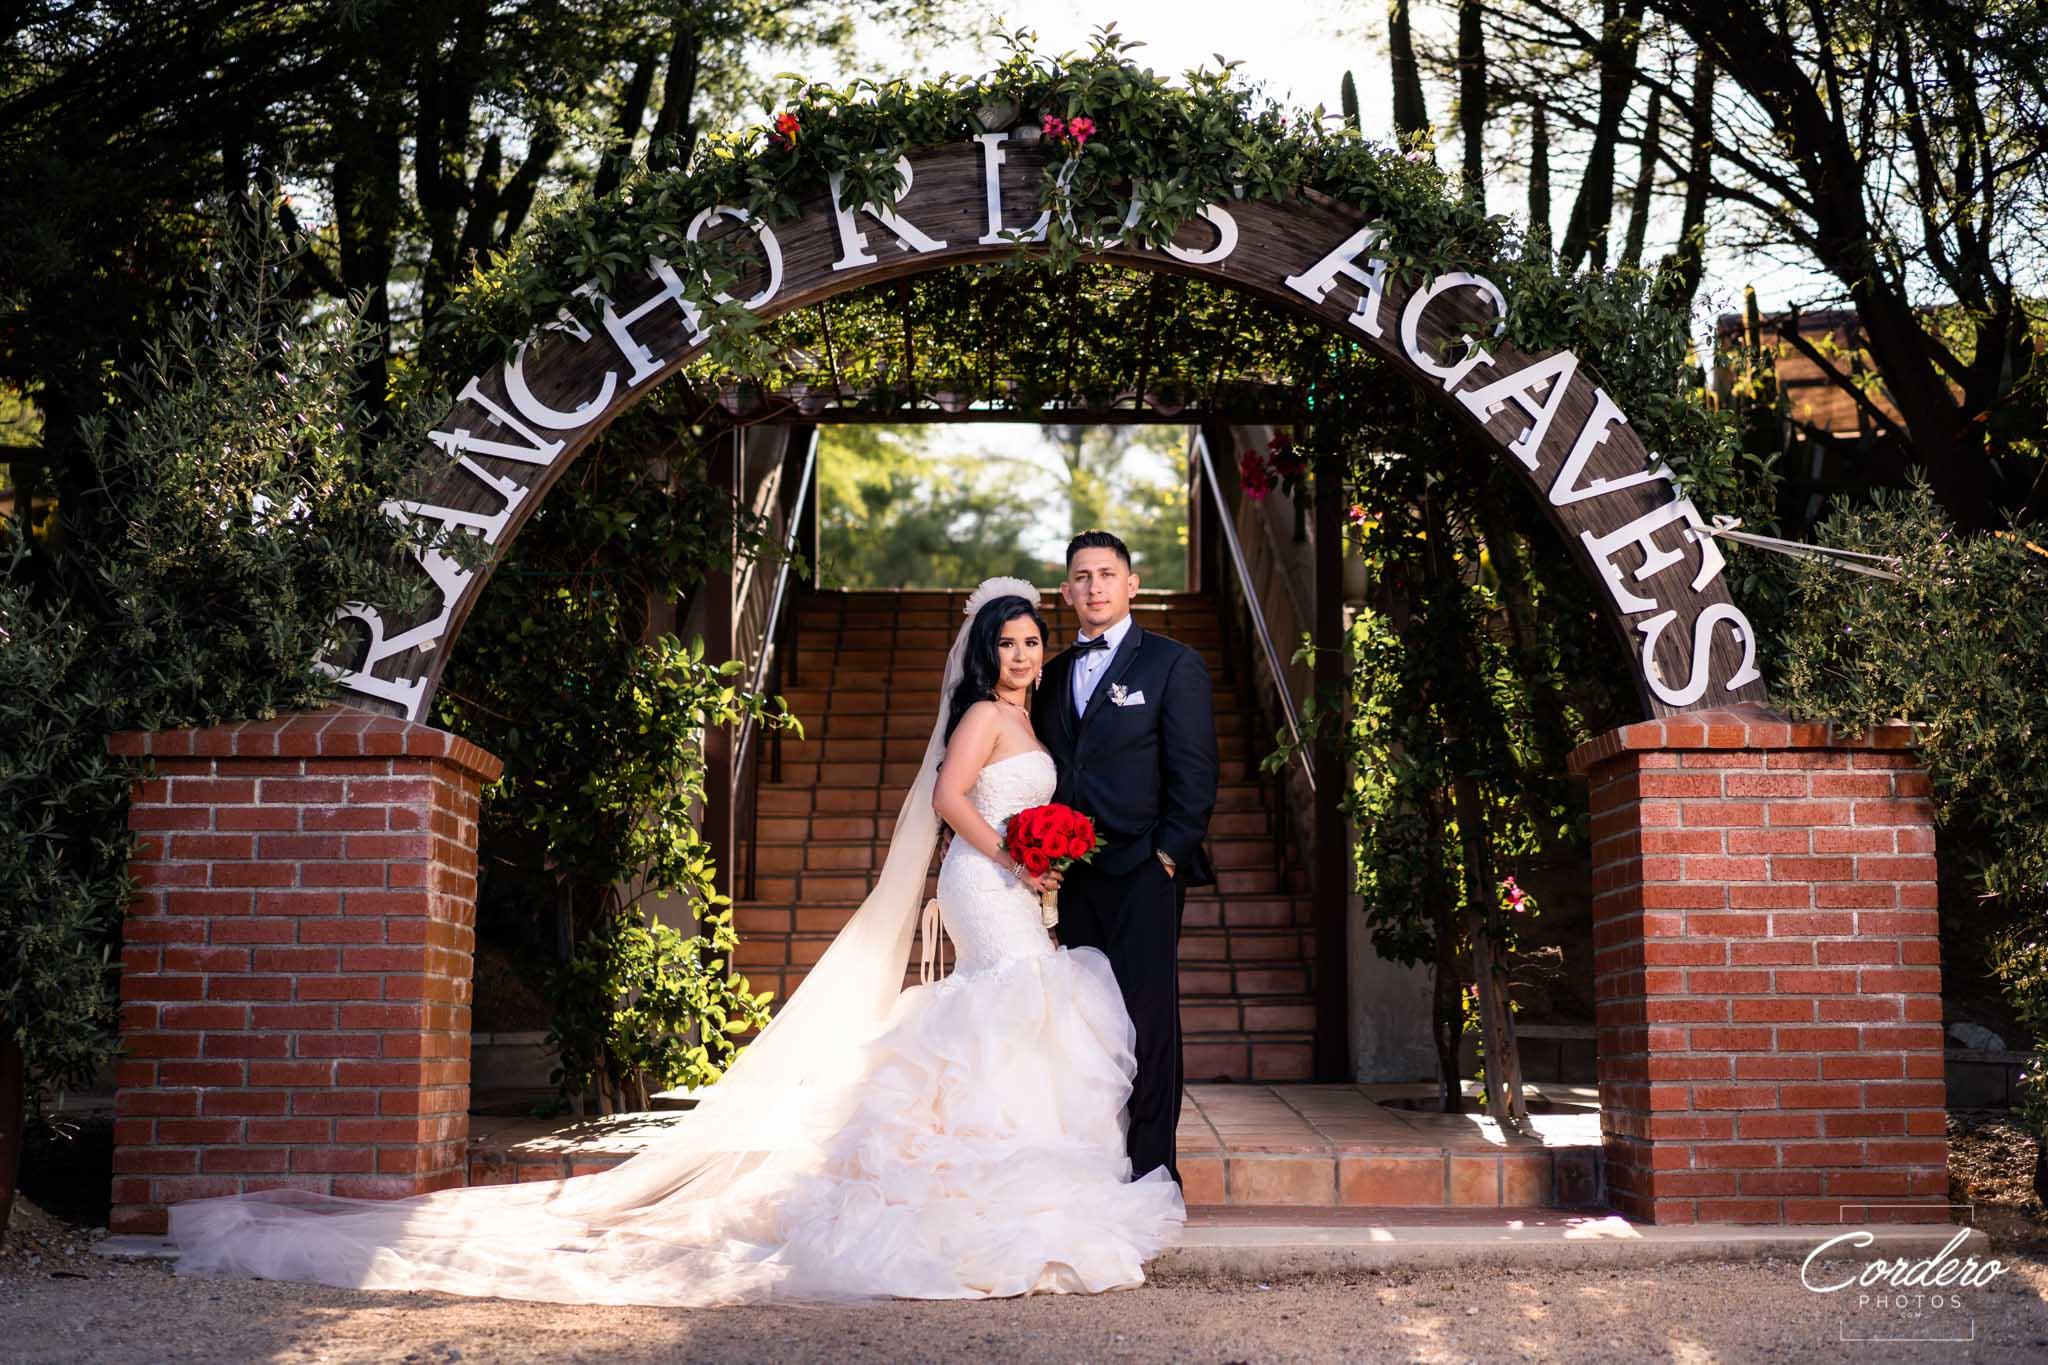 Andrea-and-Valentin-Wedding-WEB-02474.jpg